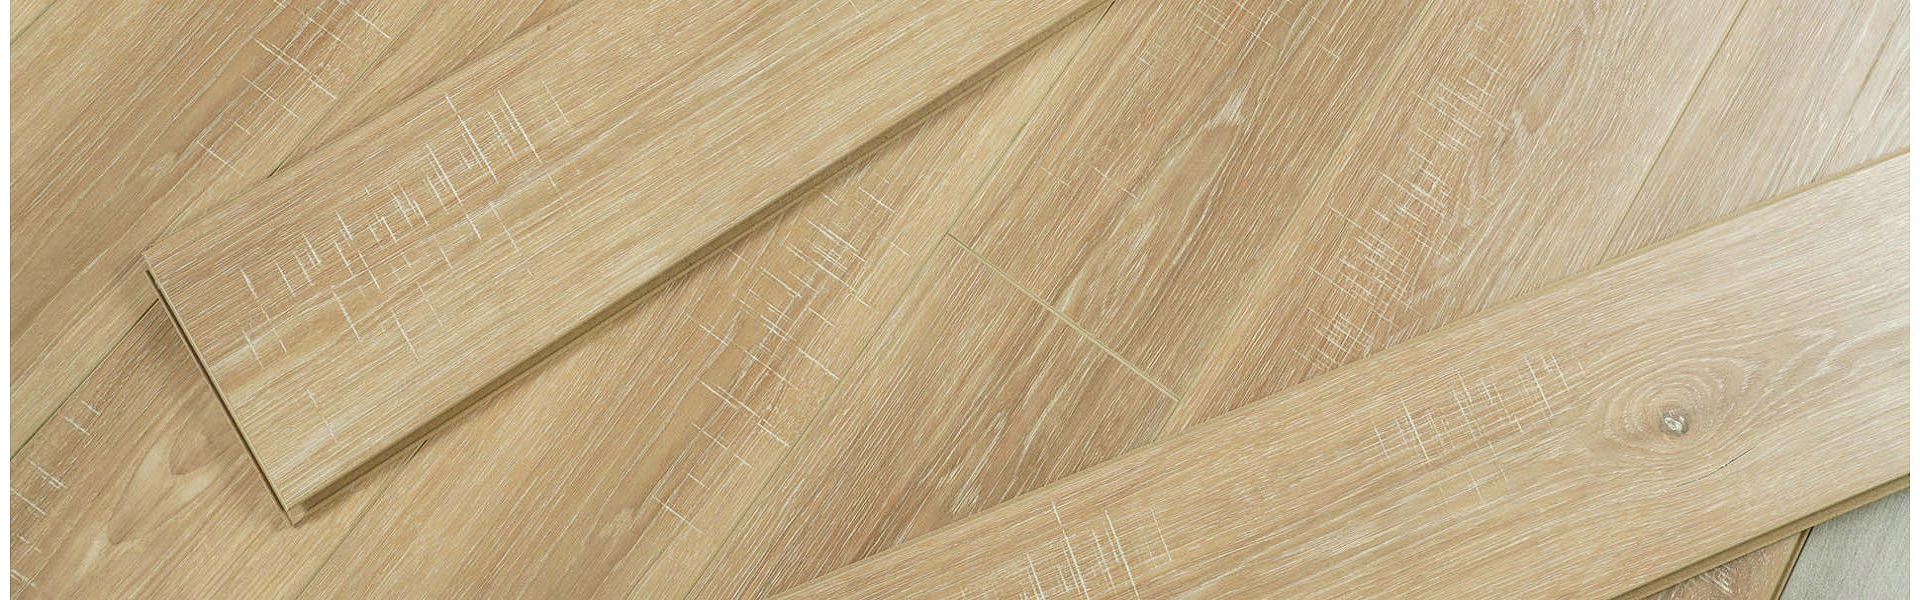 Laminate Wood Flooring, Laminate Panel Flooring